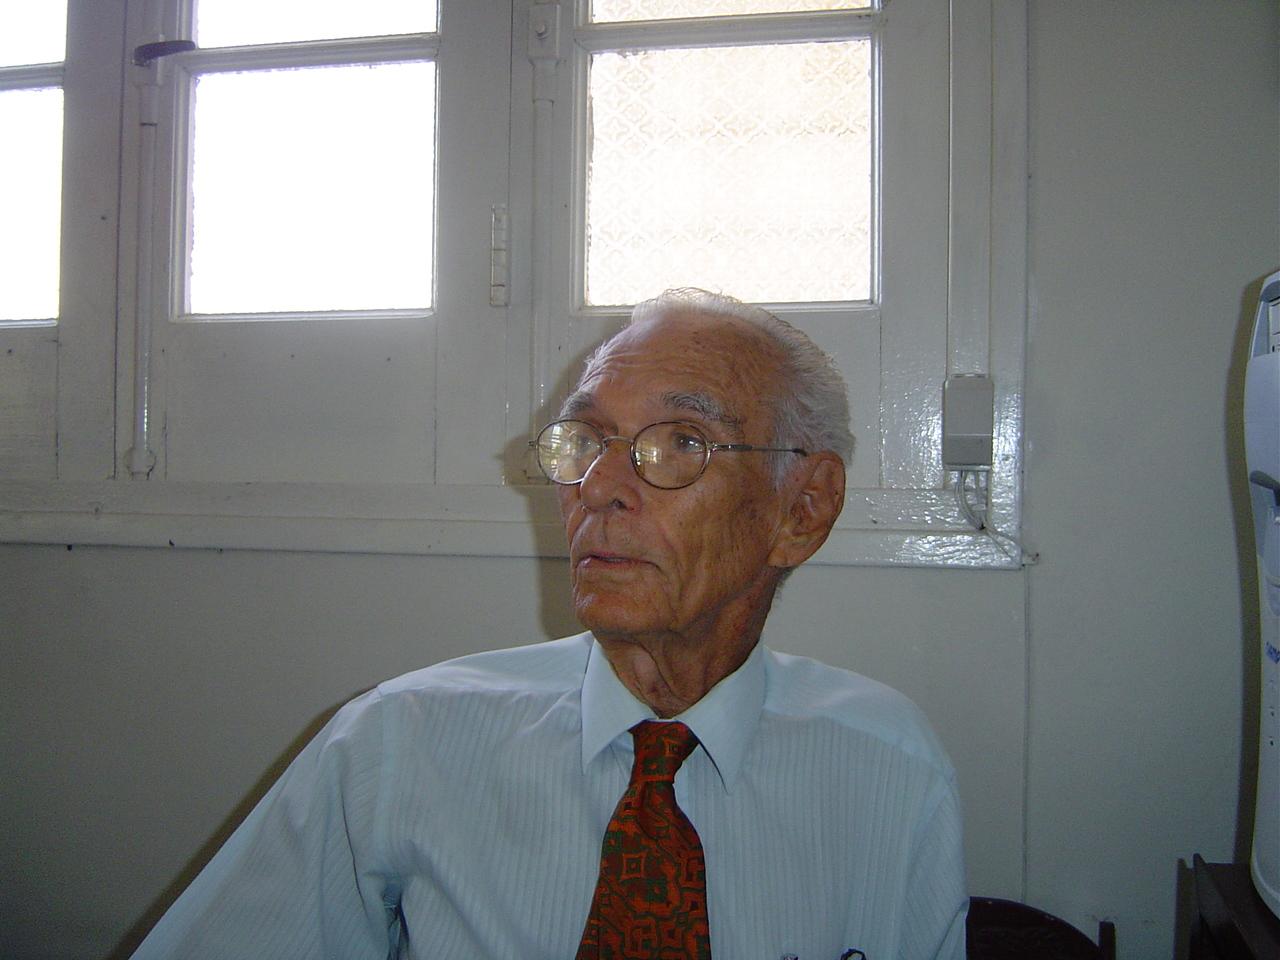 Profesor Rodríguez Gavaldá